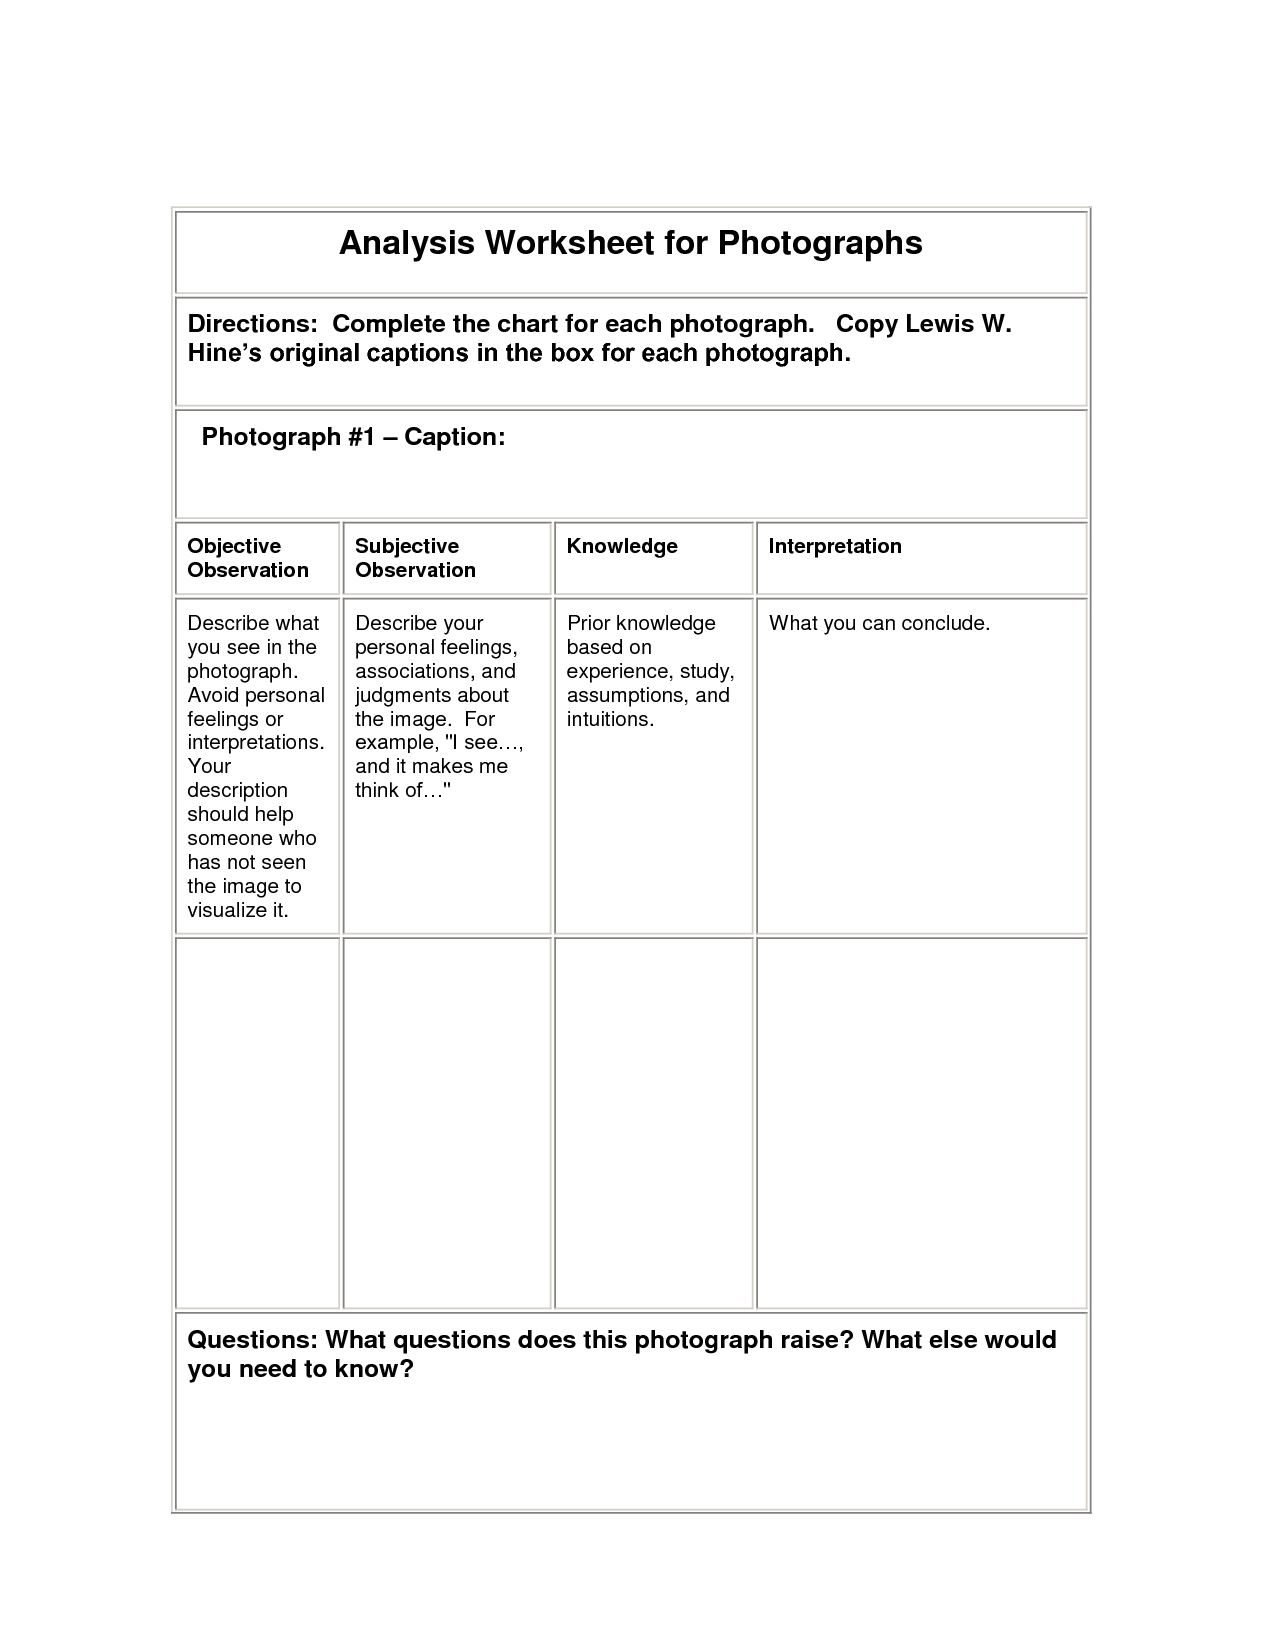 Ysis Worksheet For Lewis Hine Photographs